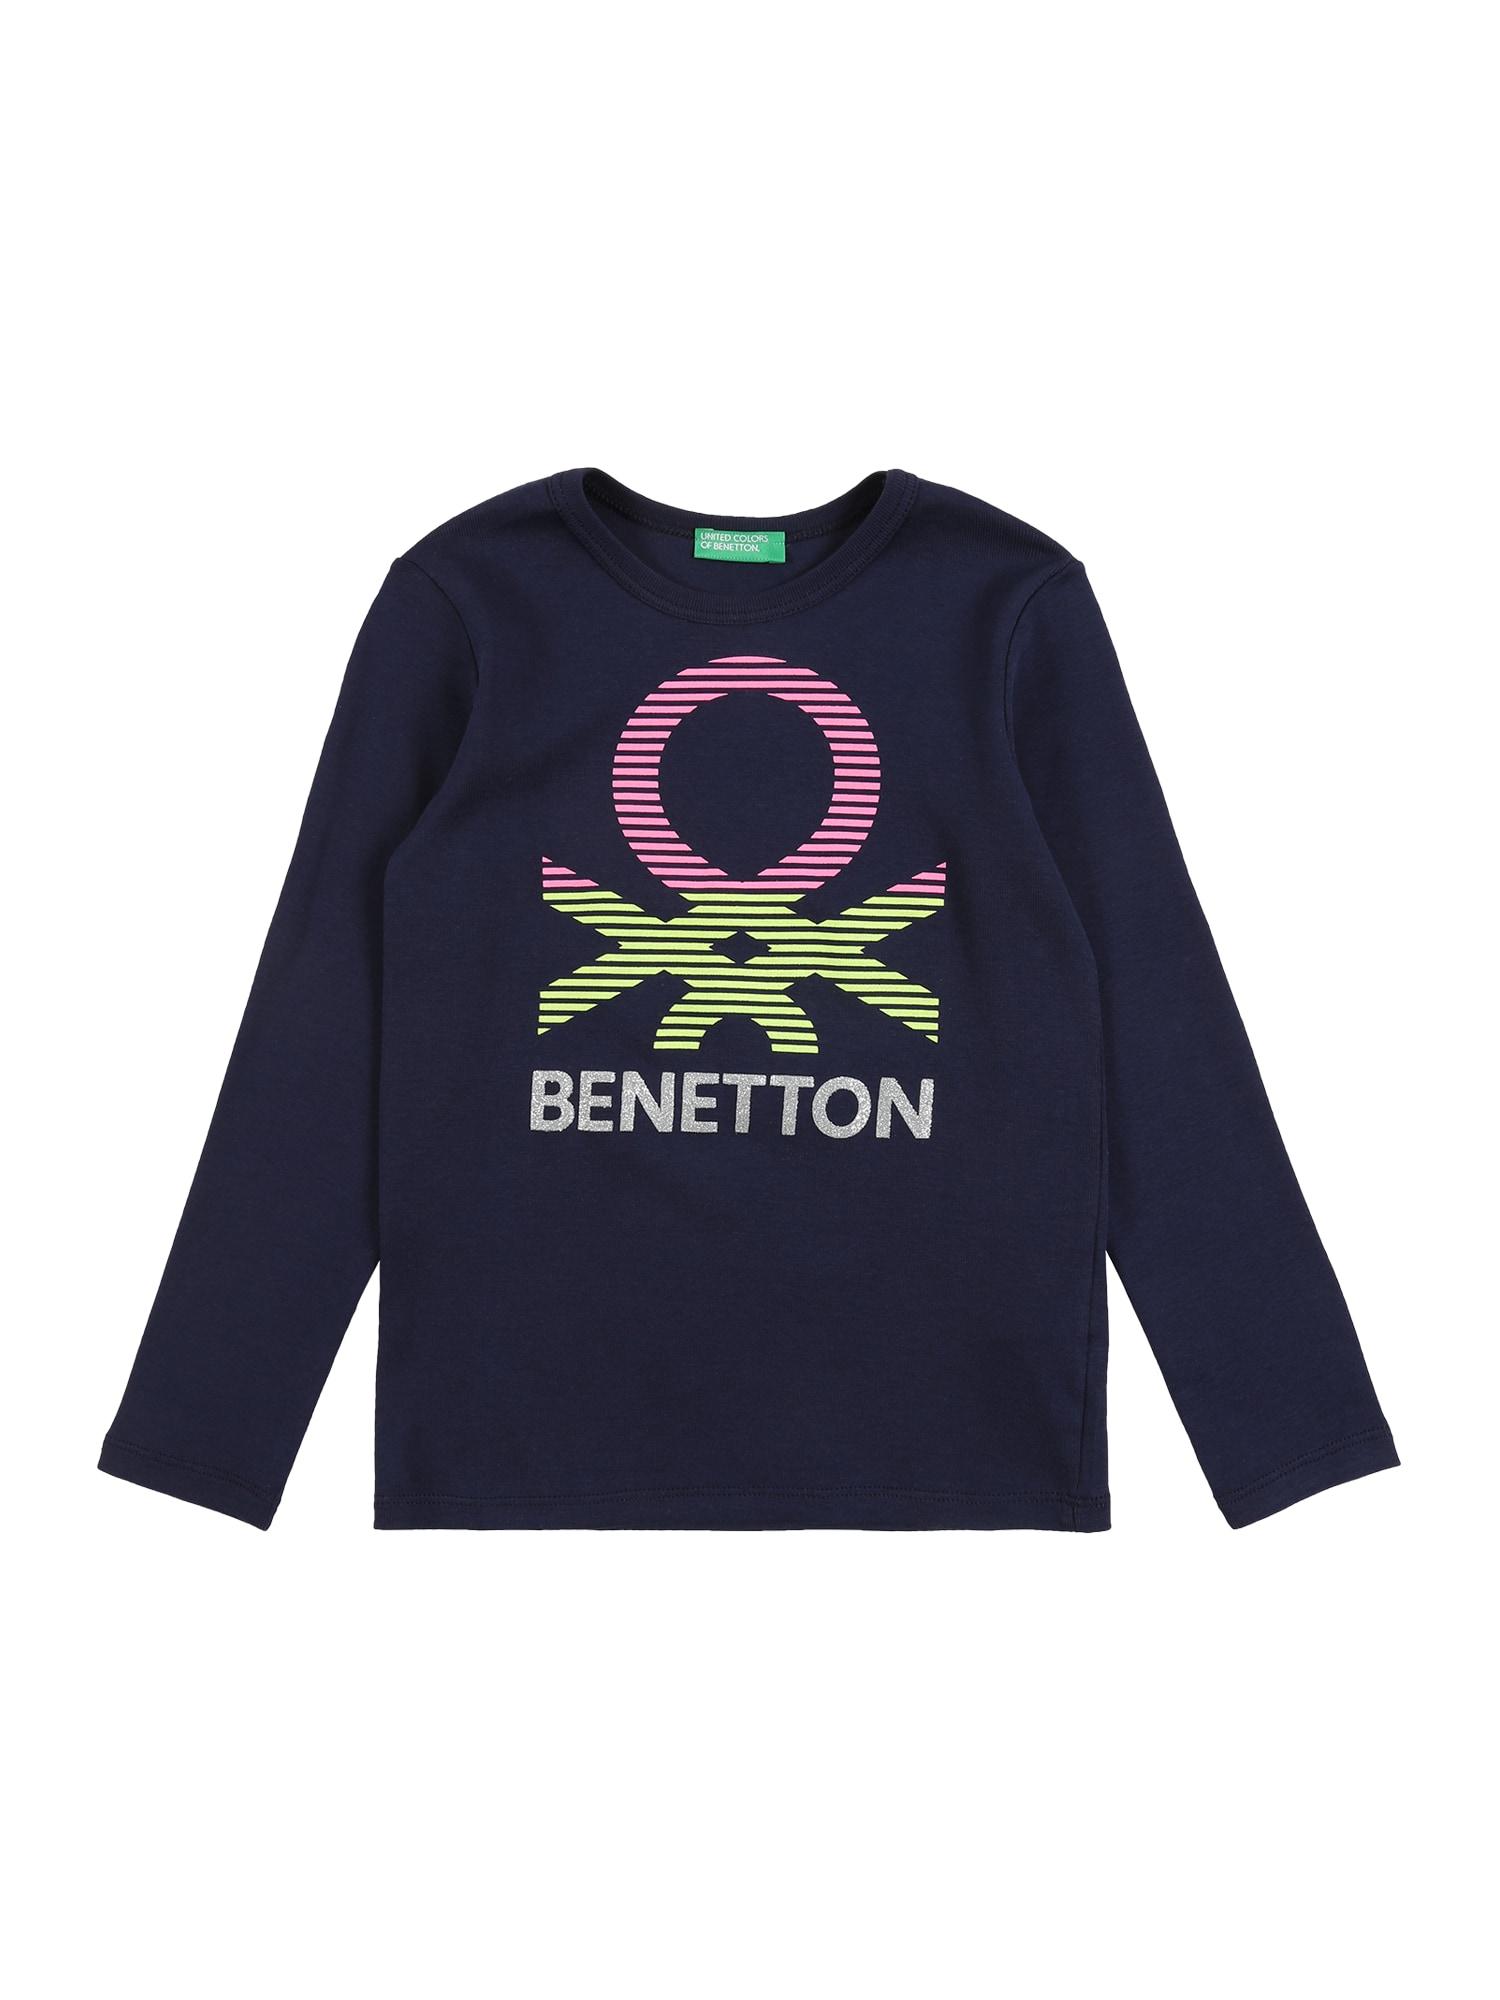 UNITED COLORS OF BENETTON Marškinėliai tamsiai mėlyna